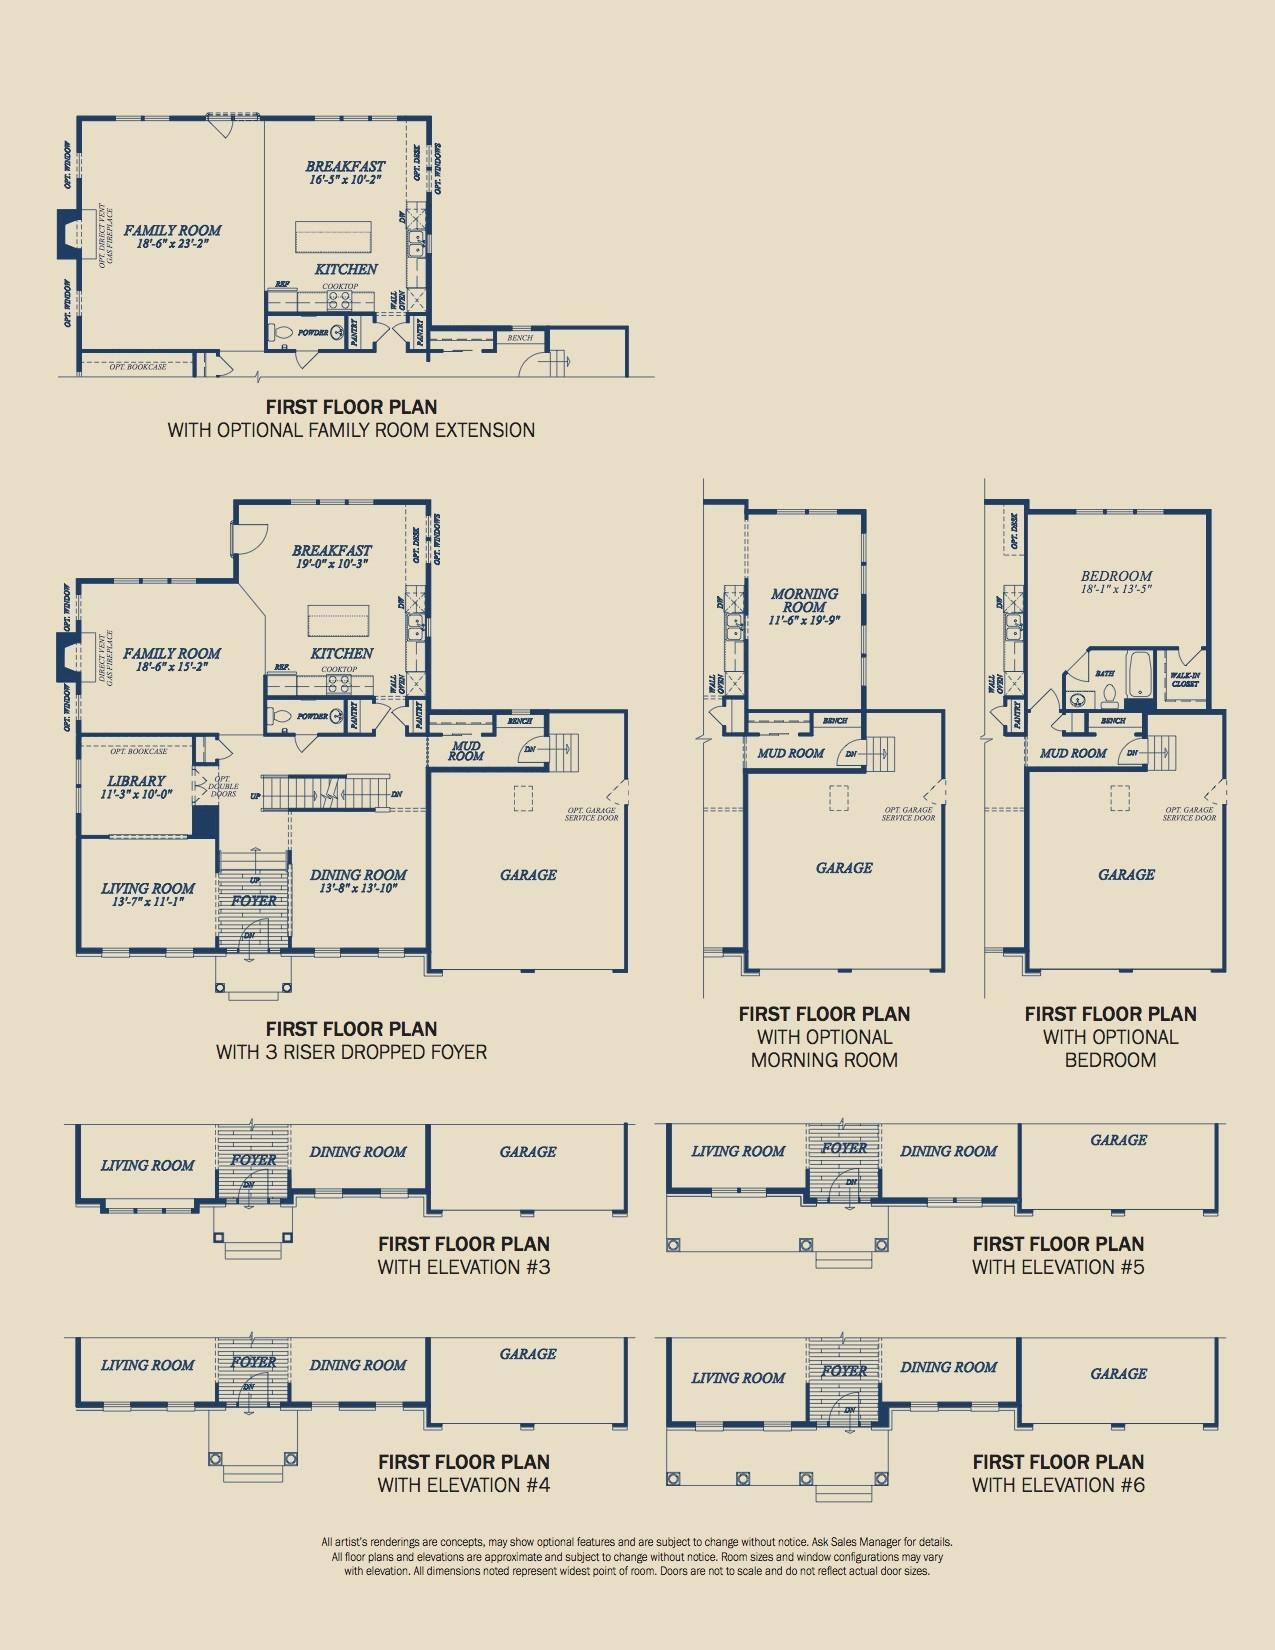 The Hamilton Brochure Page 4 - Floorplans